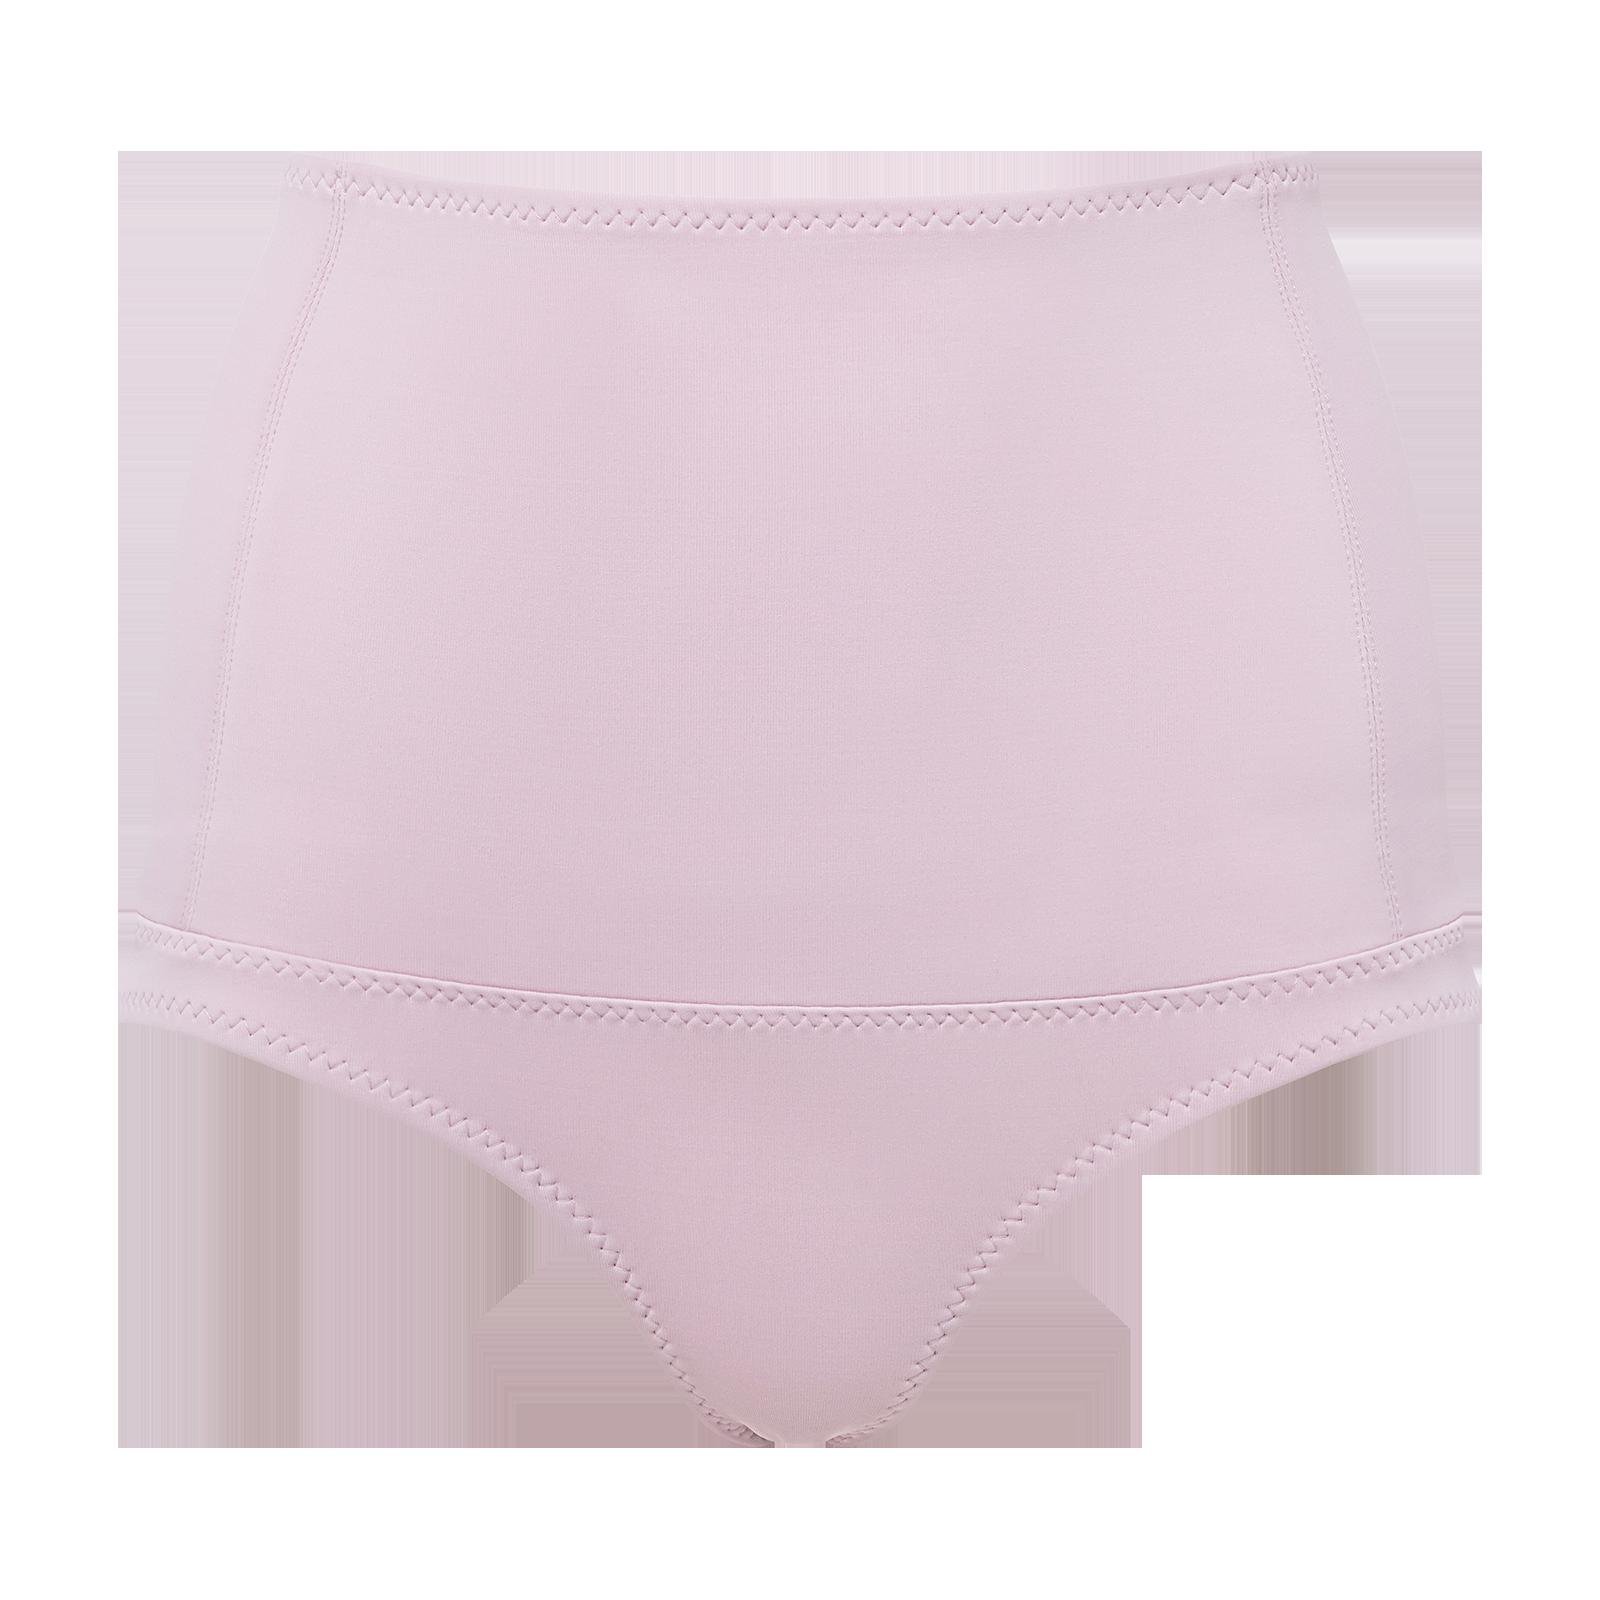 Swimwear product image